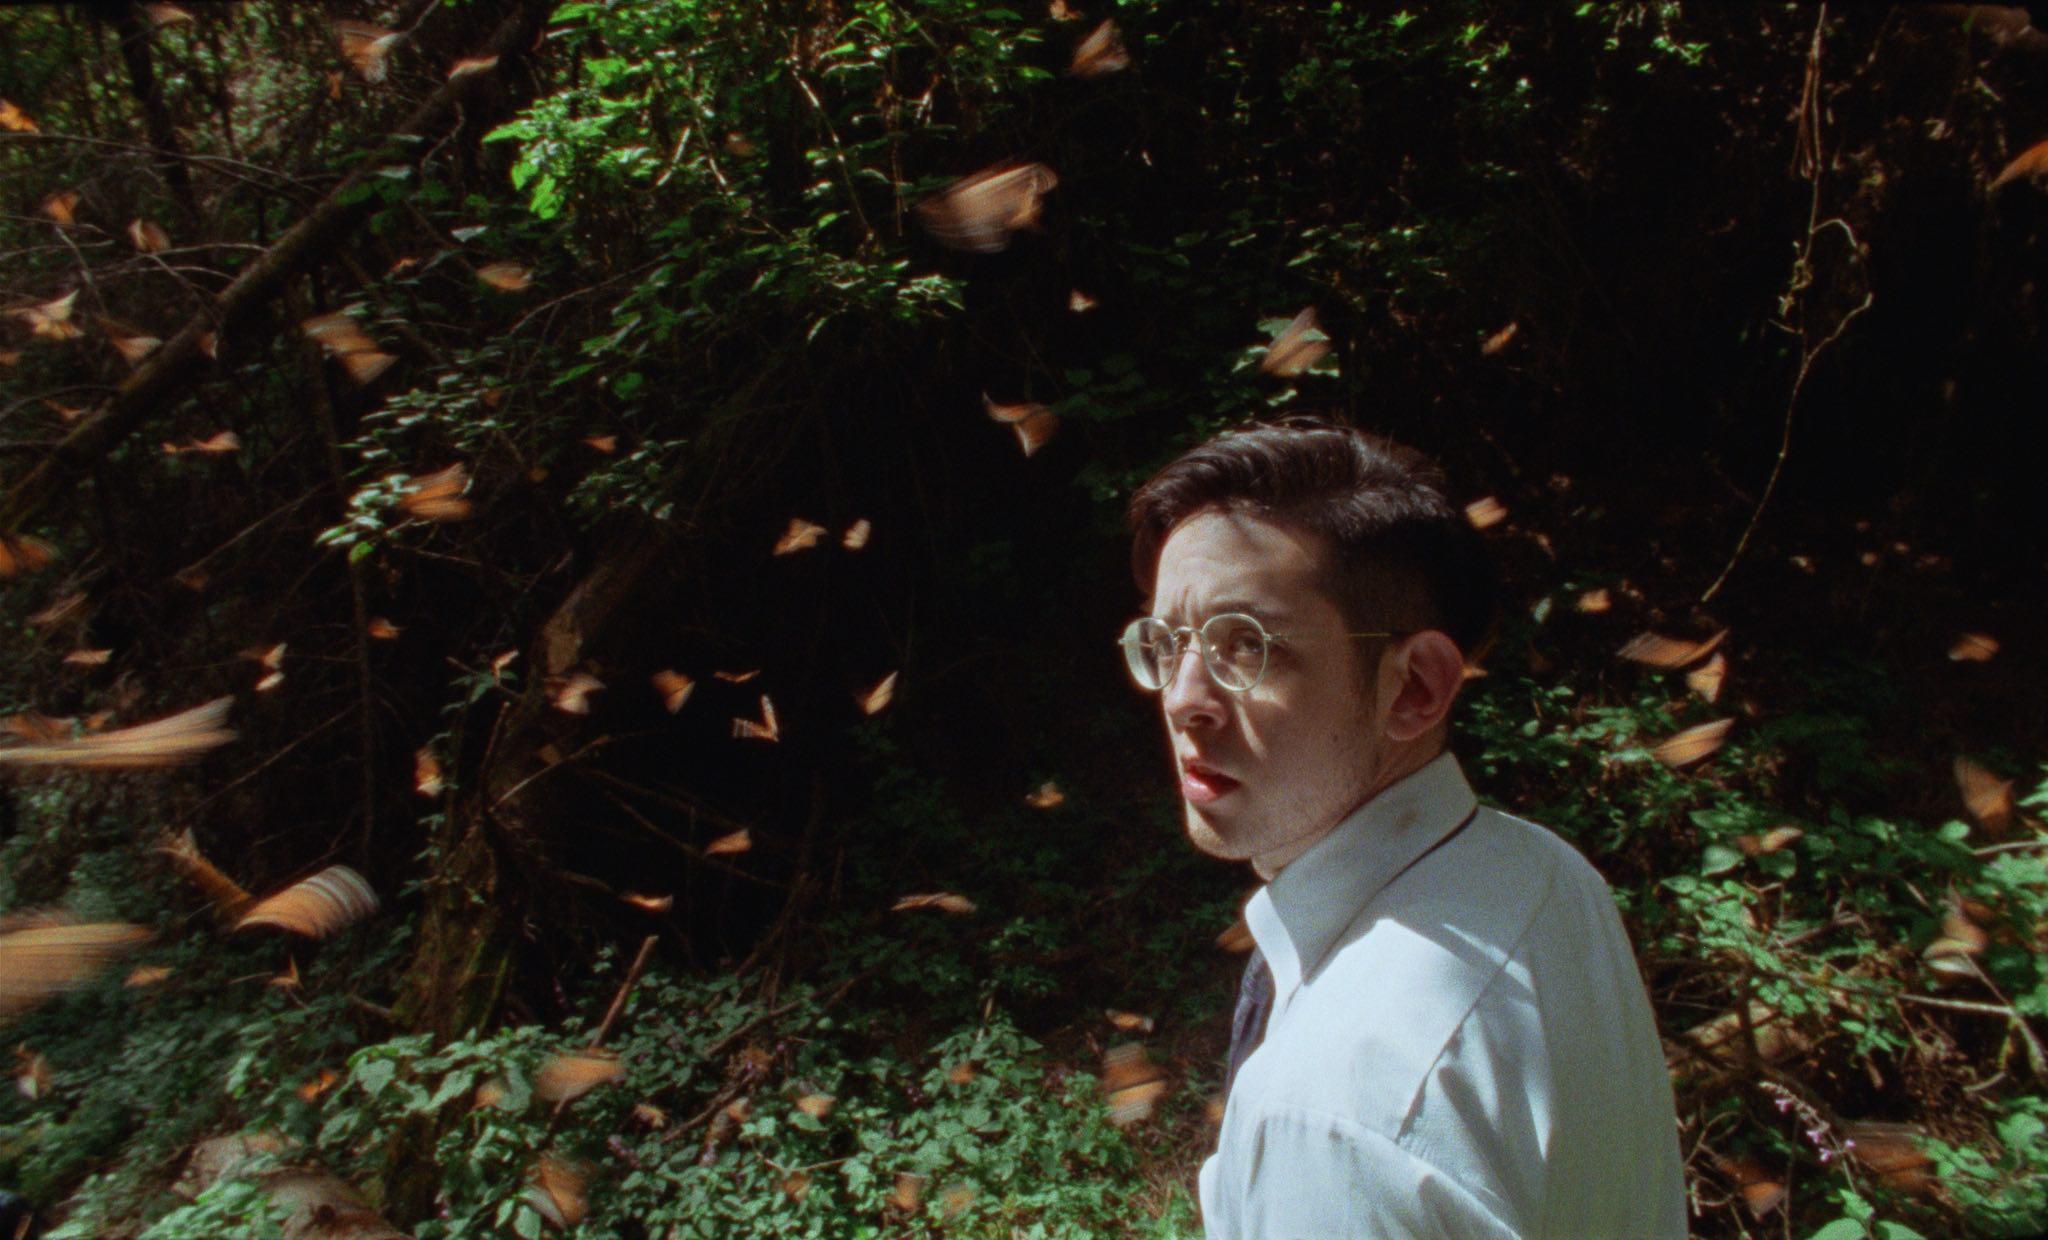 Butterfly-mackenzie sheppard-short-film